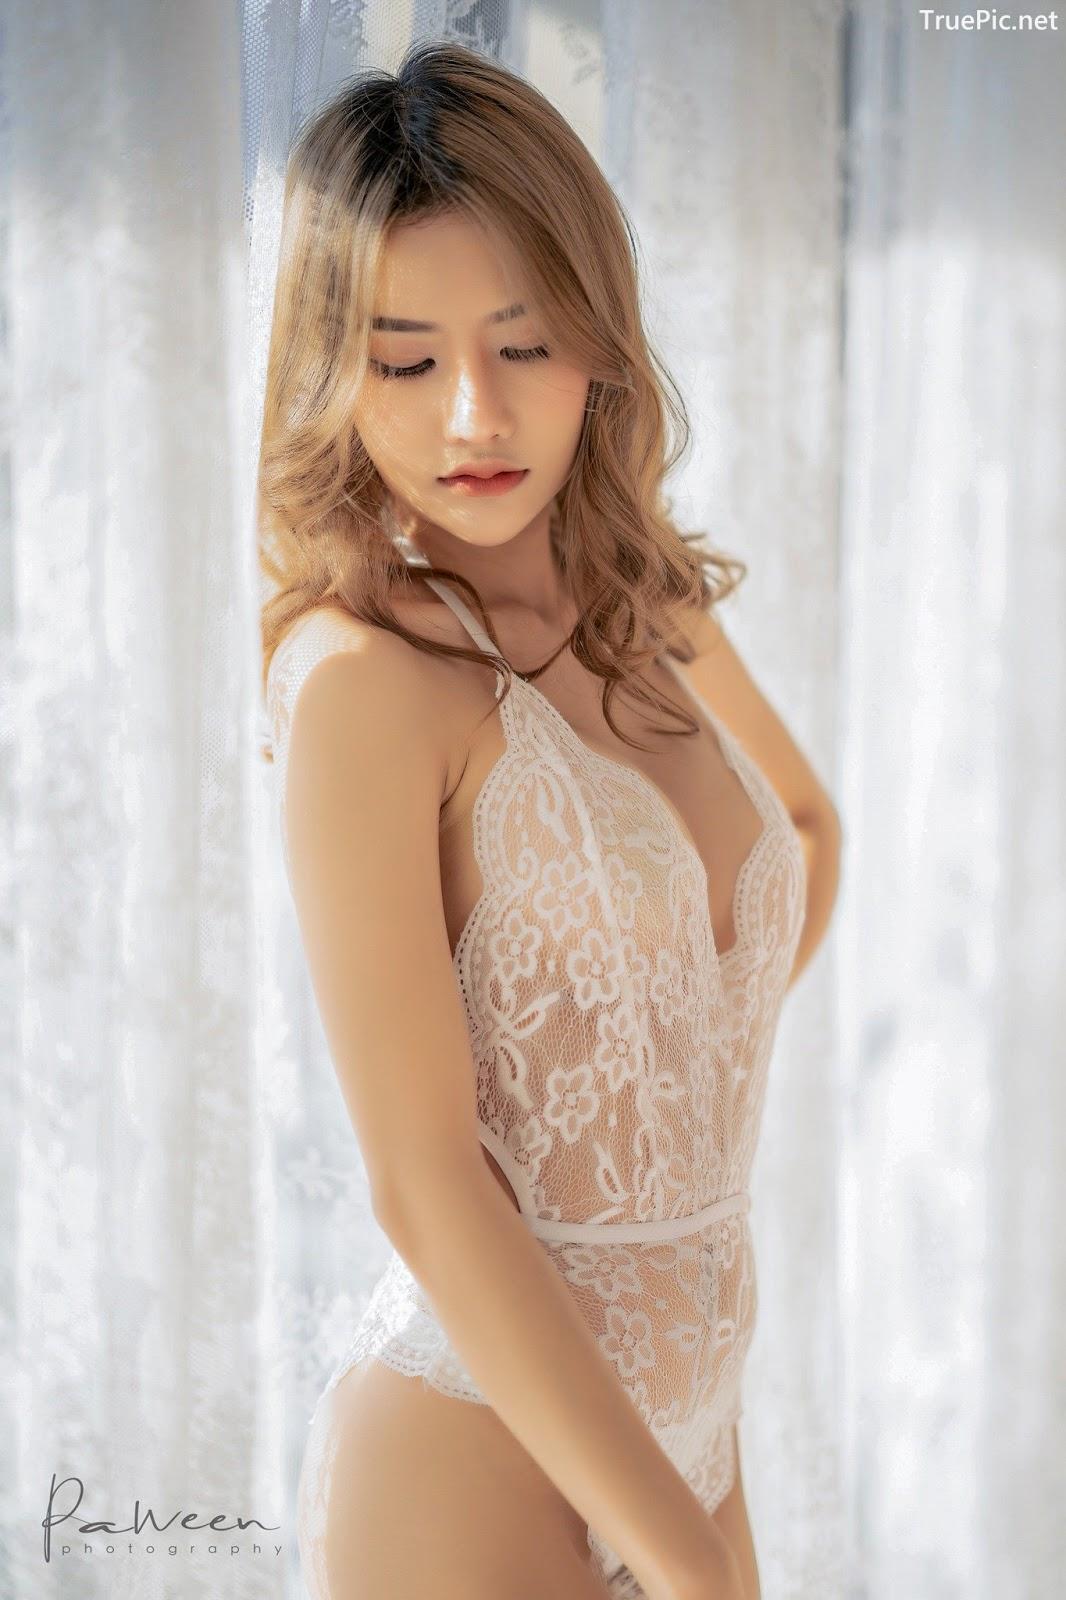 Image Thailand Model - Atittaya Chaiyasing - White Lace Lingerie - TruePic.net - Picture-4